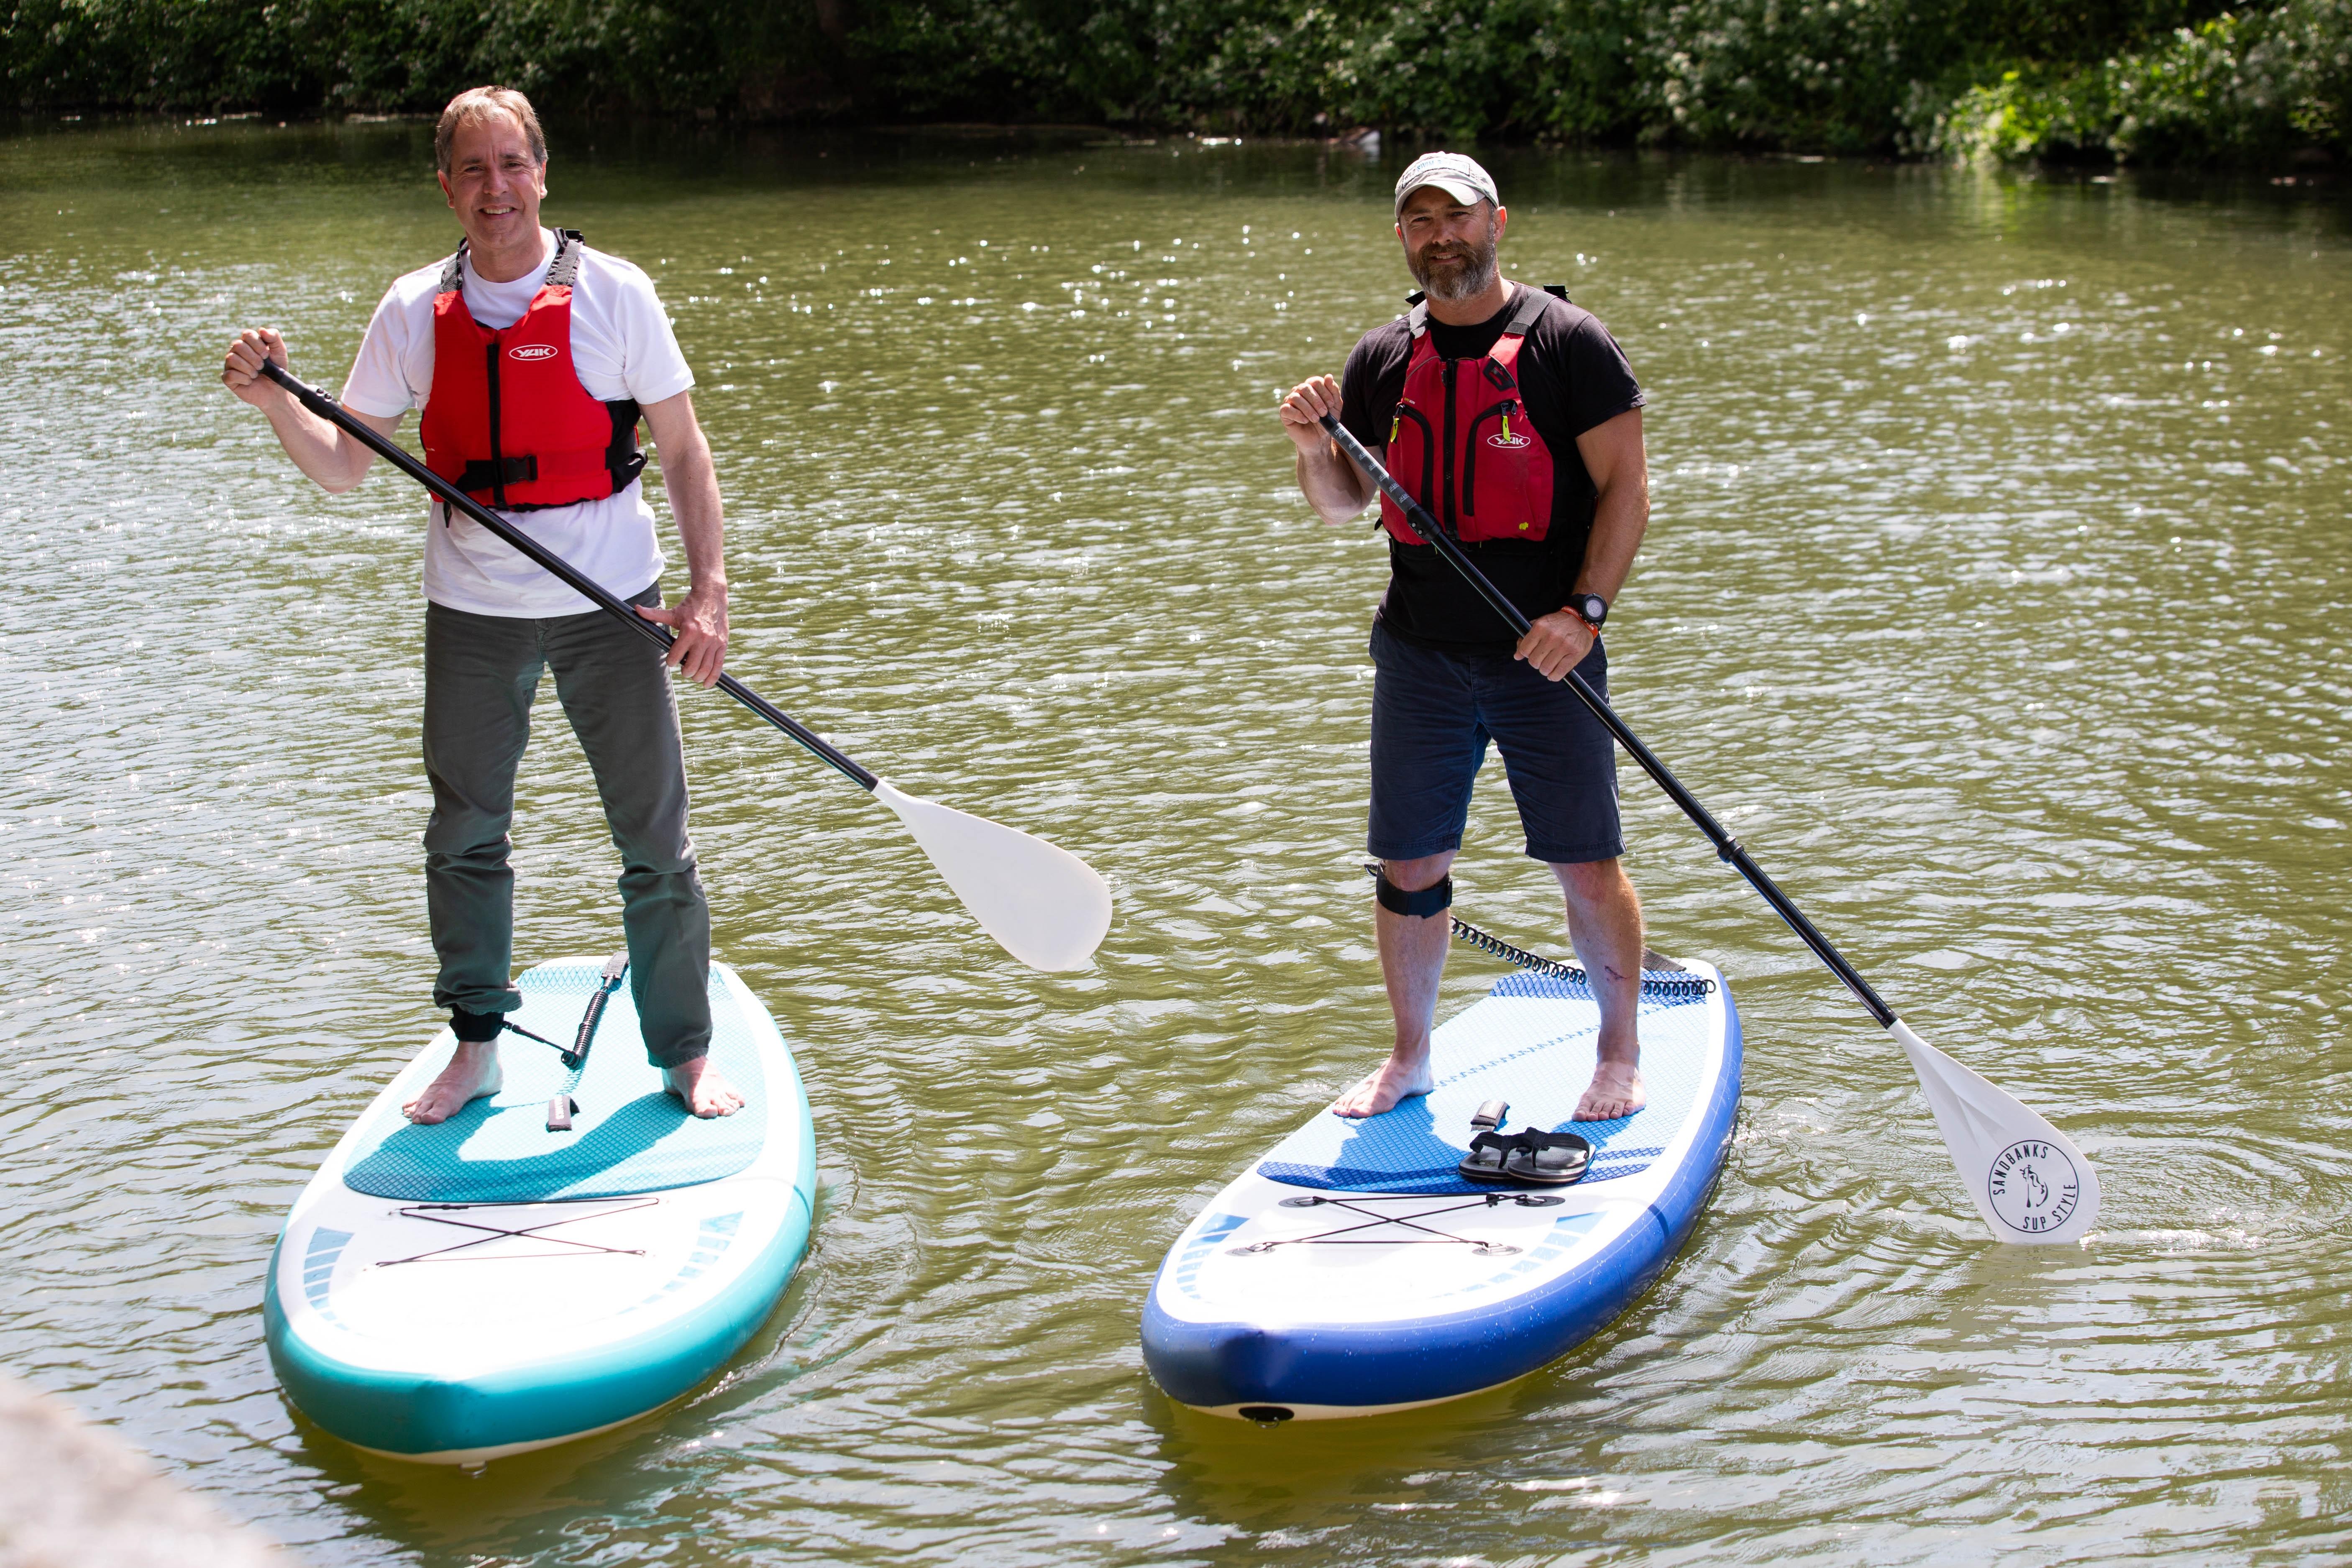 Metro Mayor on paddleboard with Darroch Davidson